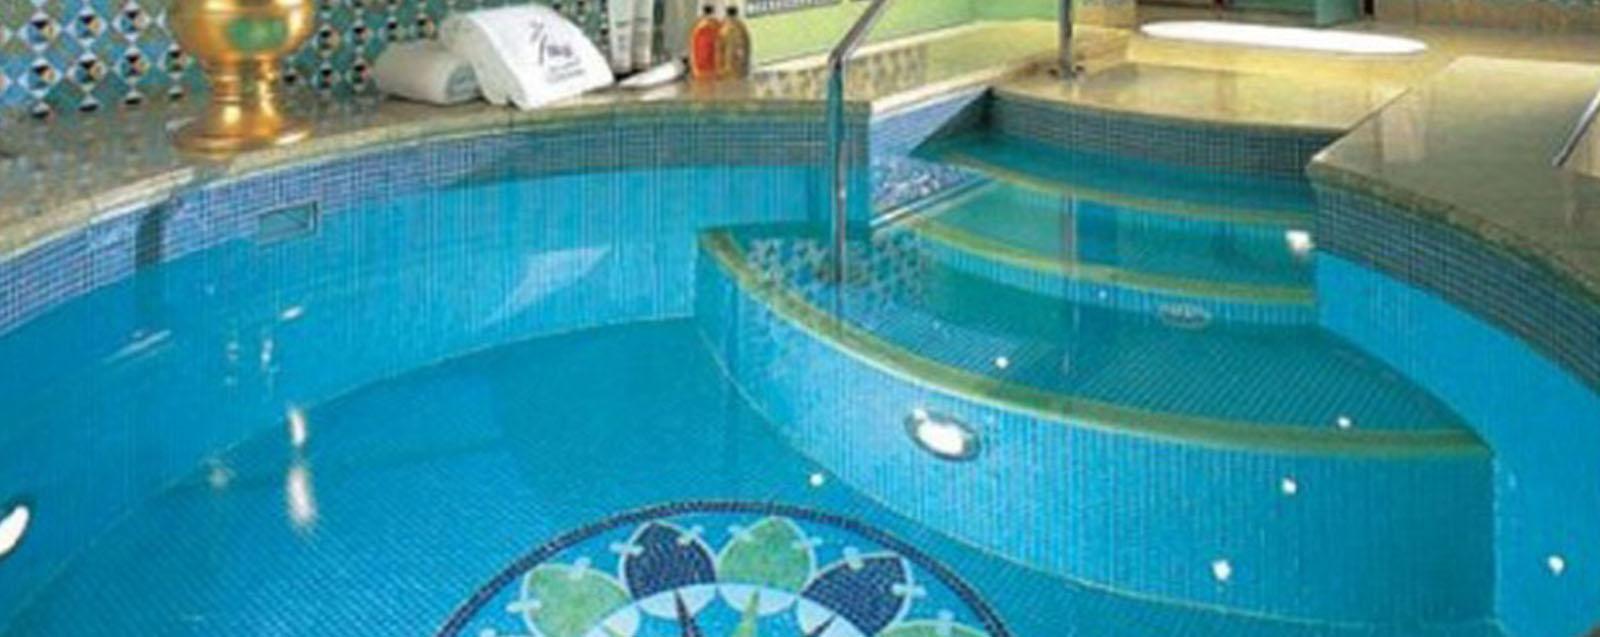 Blosssoms associates swimming pool designer chennai Swimming pool construction in chennai